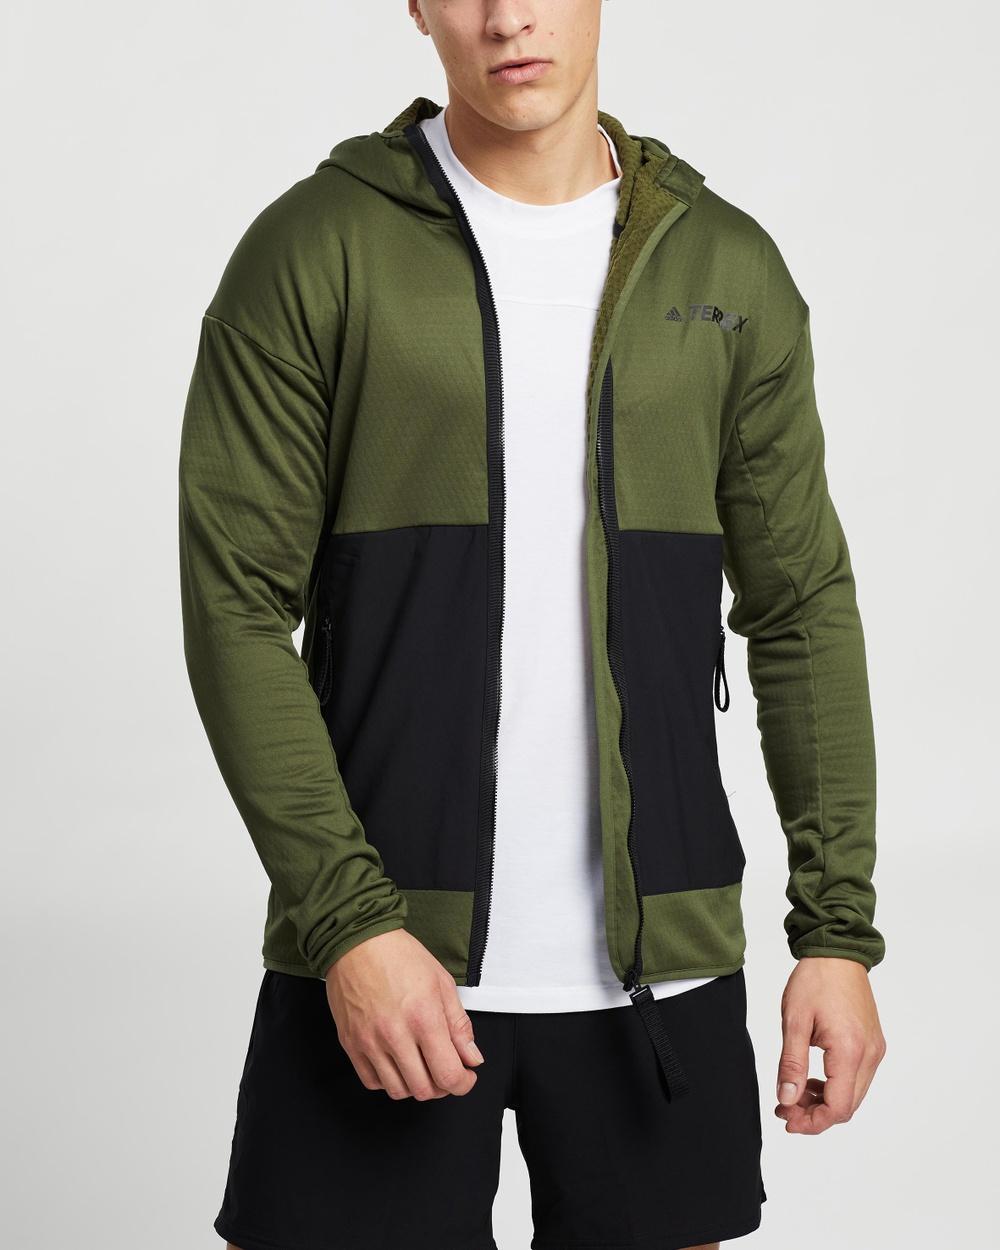 adidas Performance Terrex Tech Fleece Light Hooded Hiking Jacket Coats & Jackets Wild Pine Black